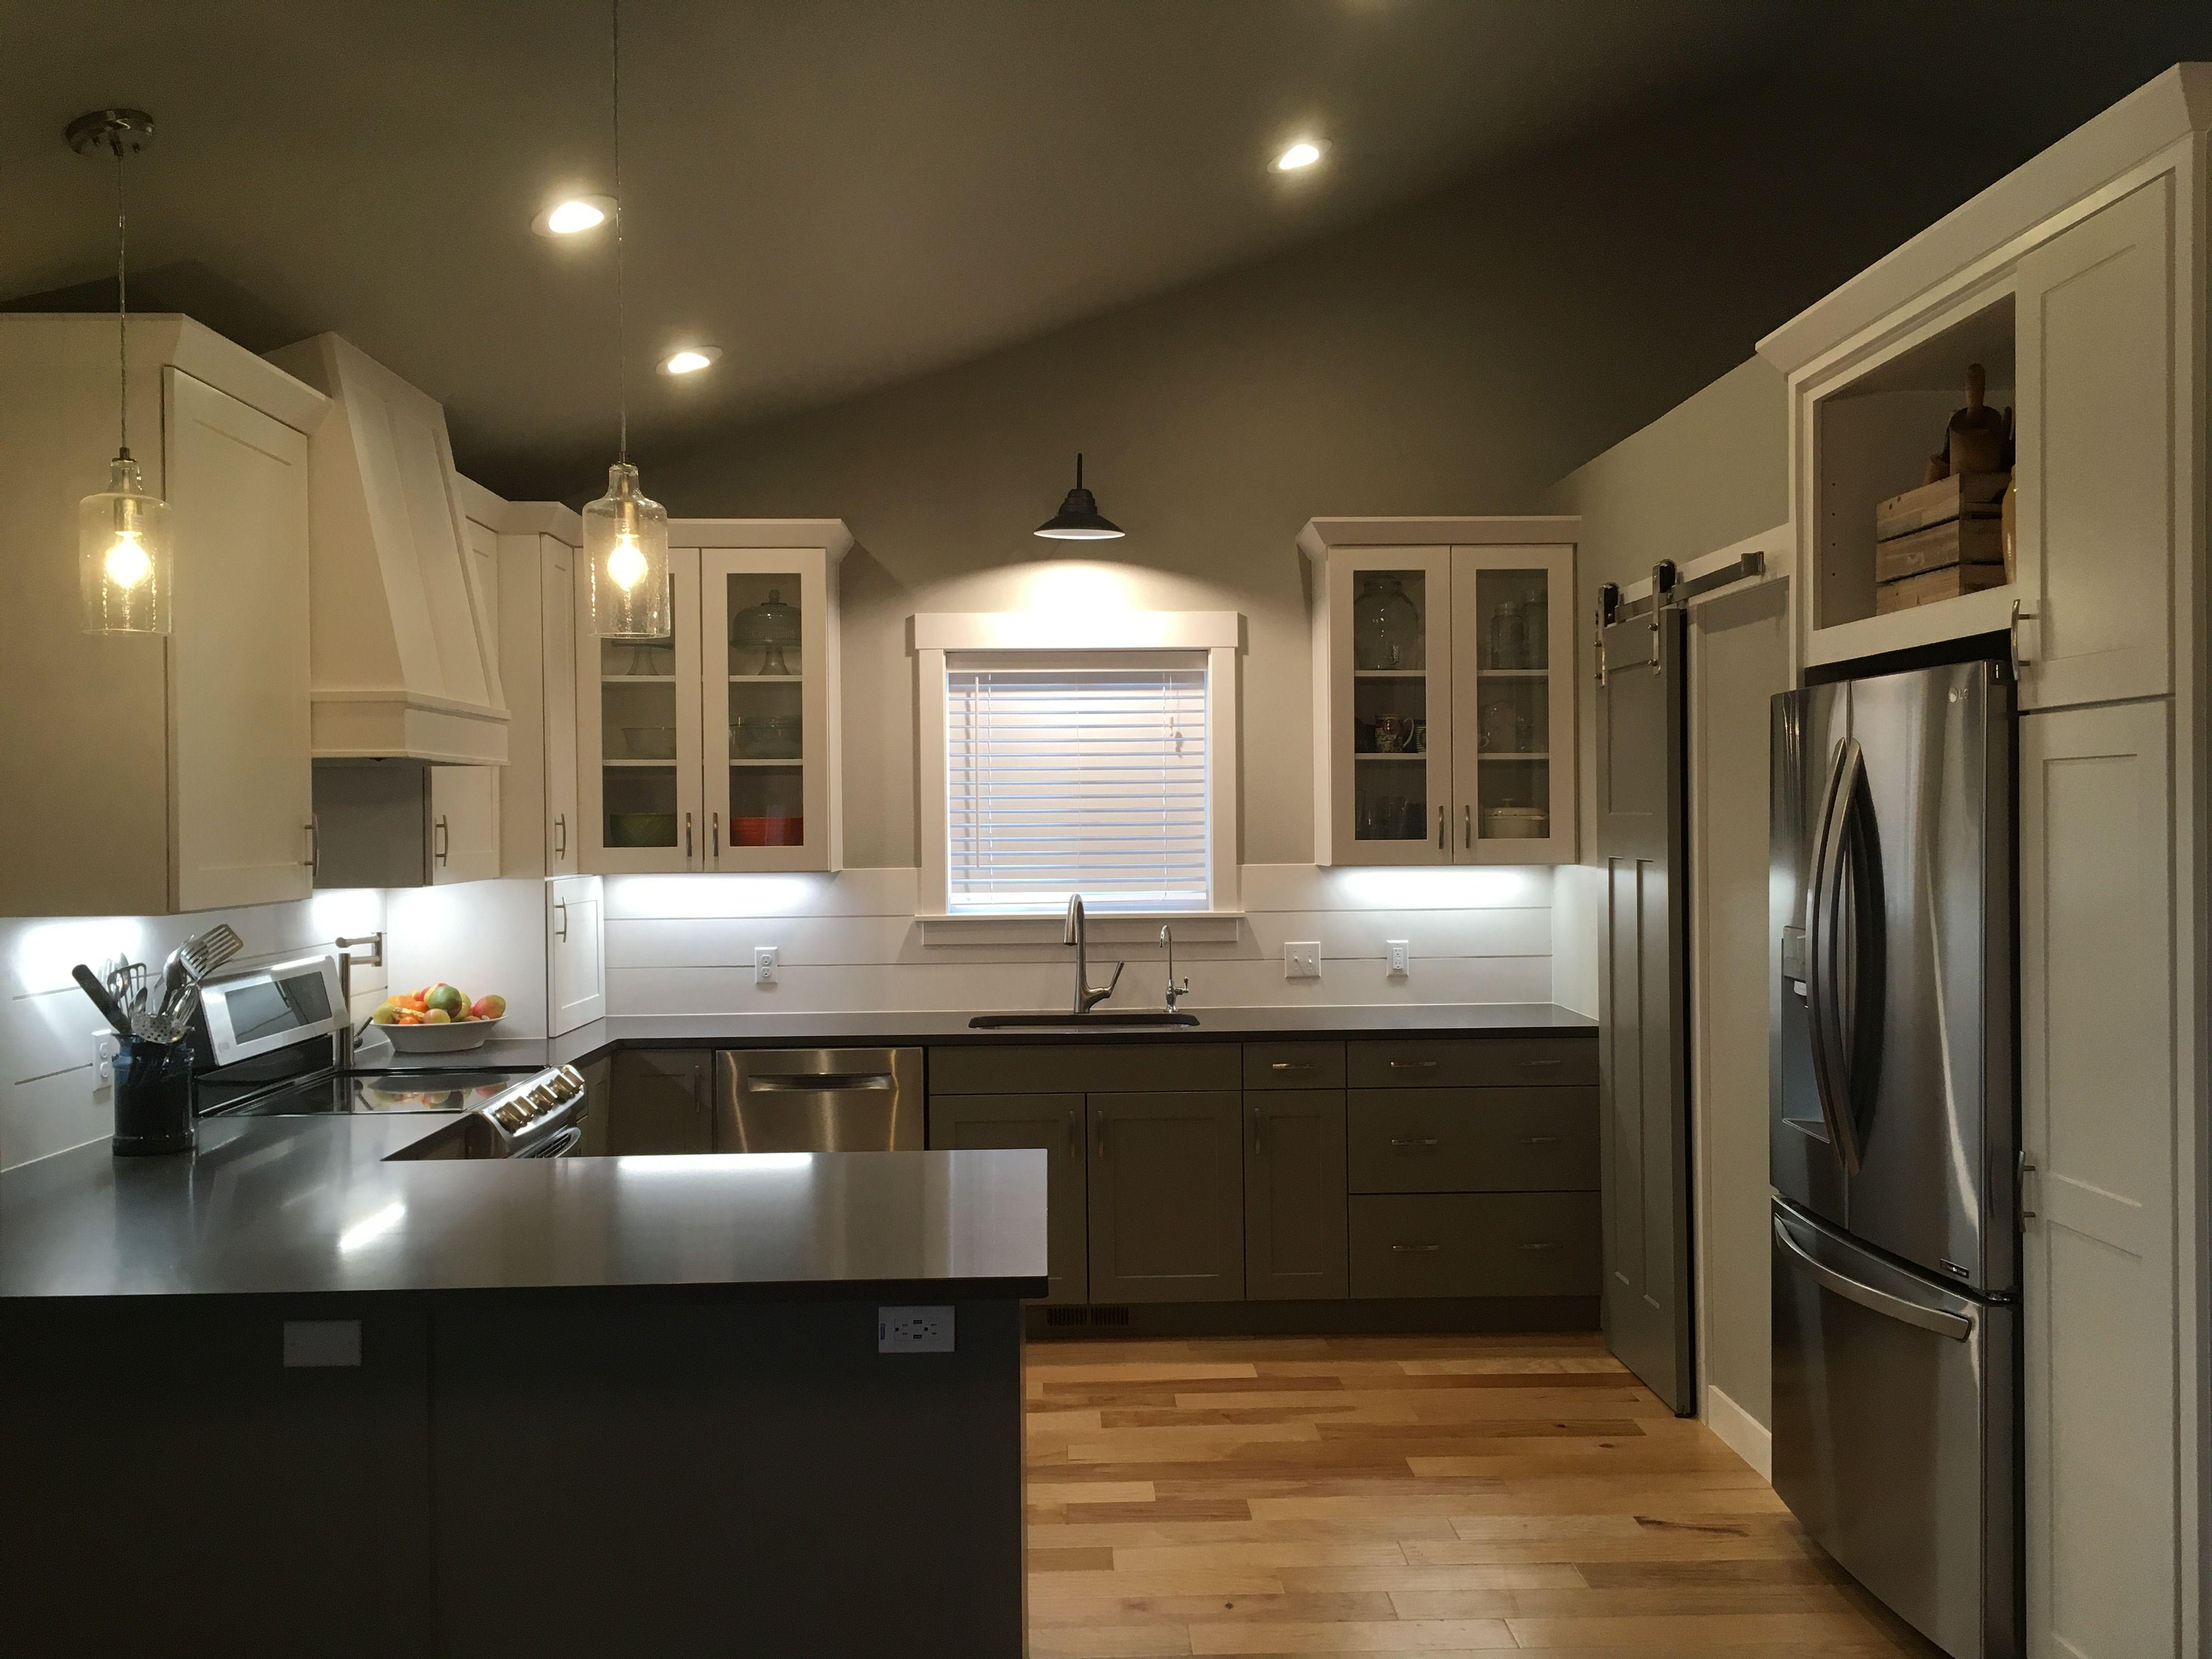 Best Farmhouse Kitchen White Upper Cabinets Sherwin Williams 400 x 300